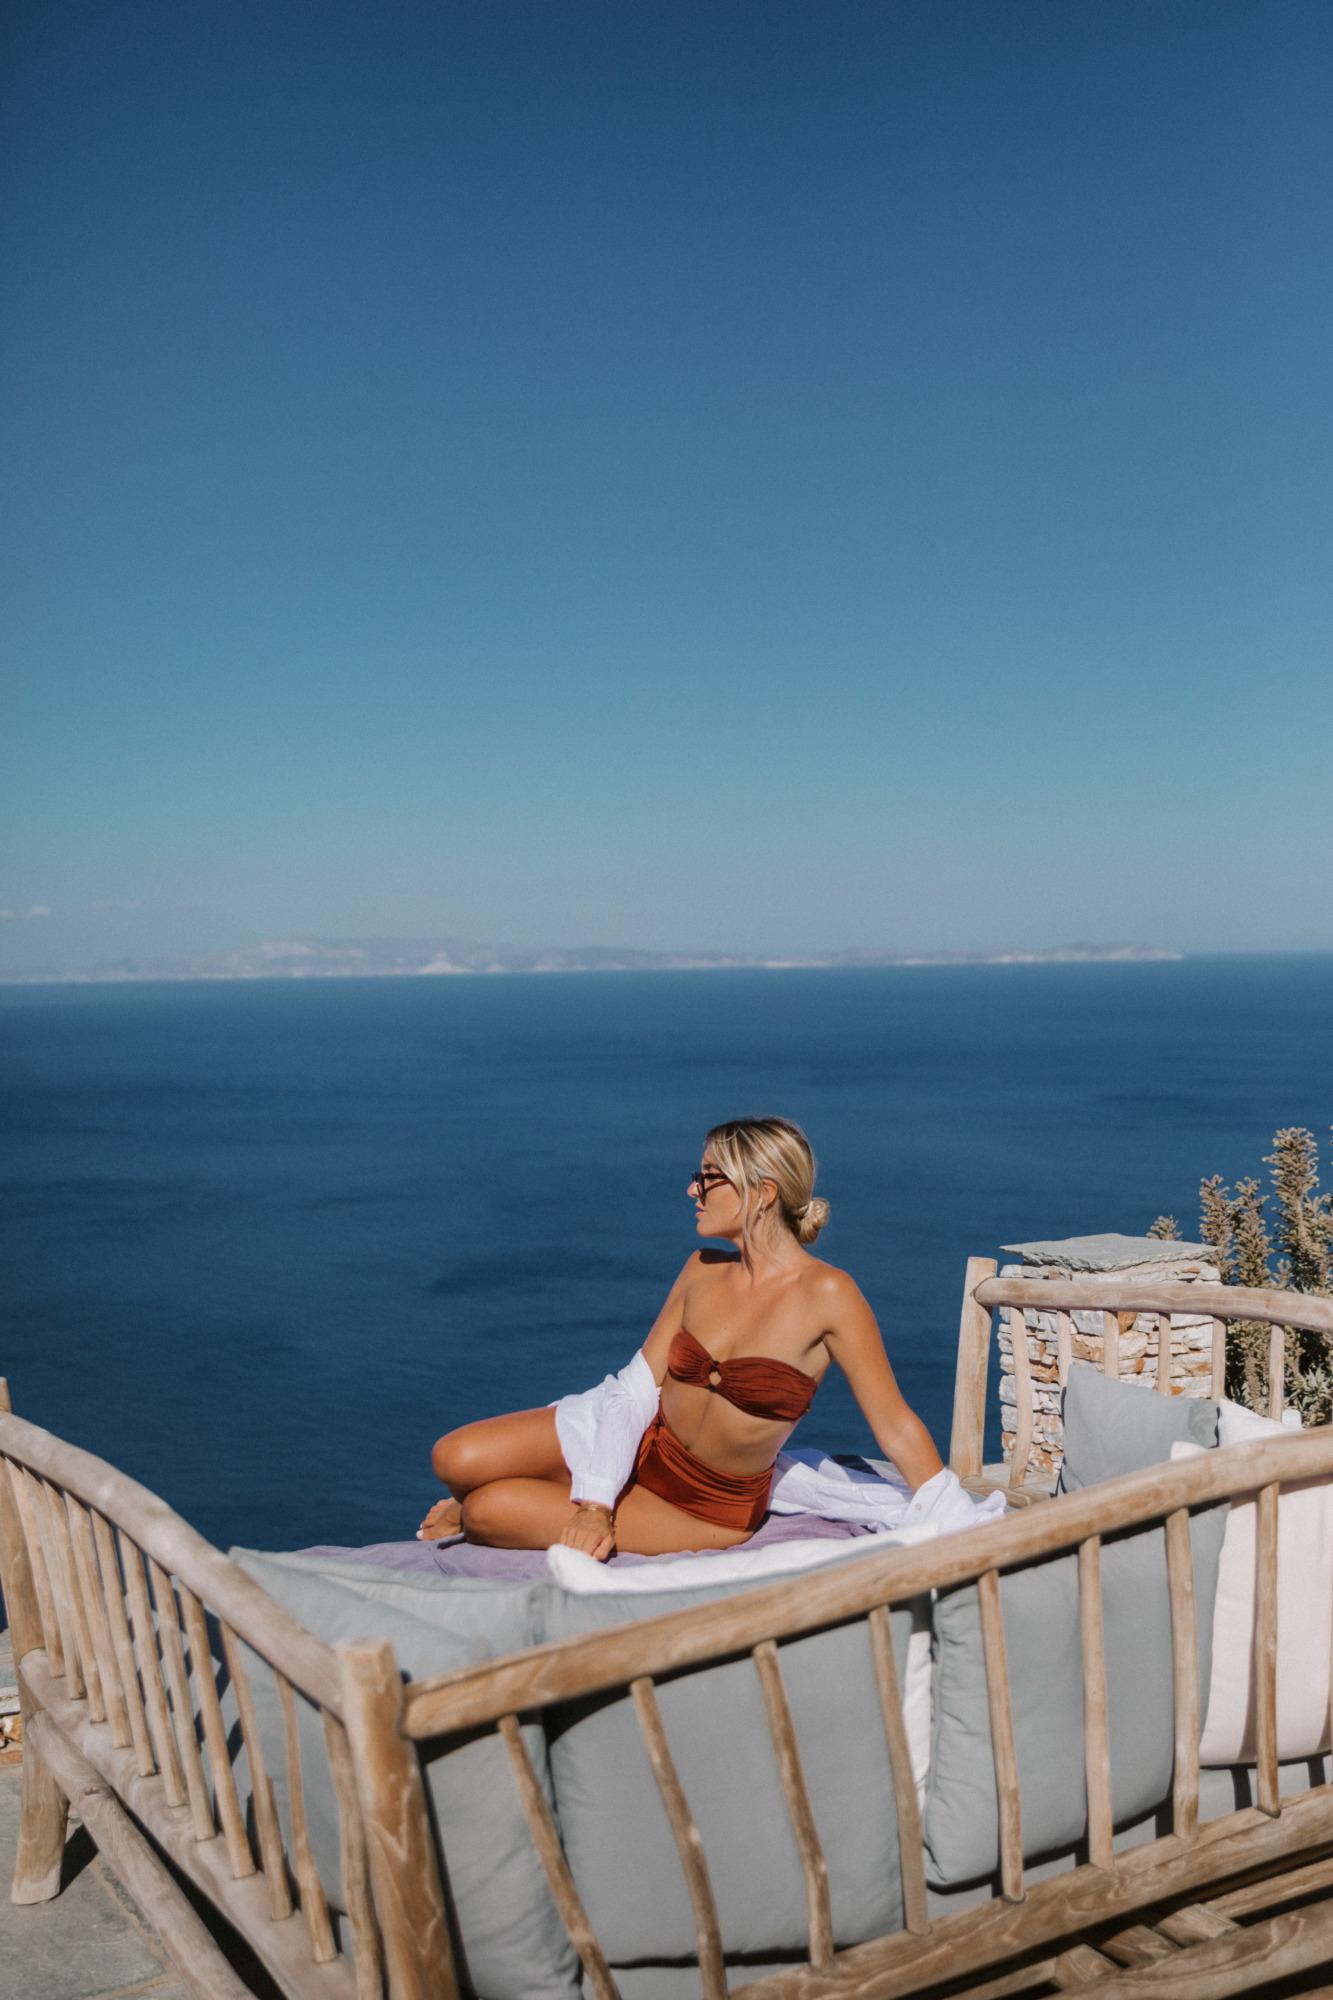 Que visiter à Sifnos - Blondie Baby blog voyages